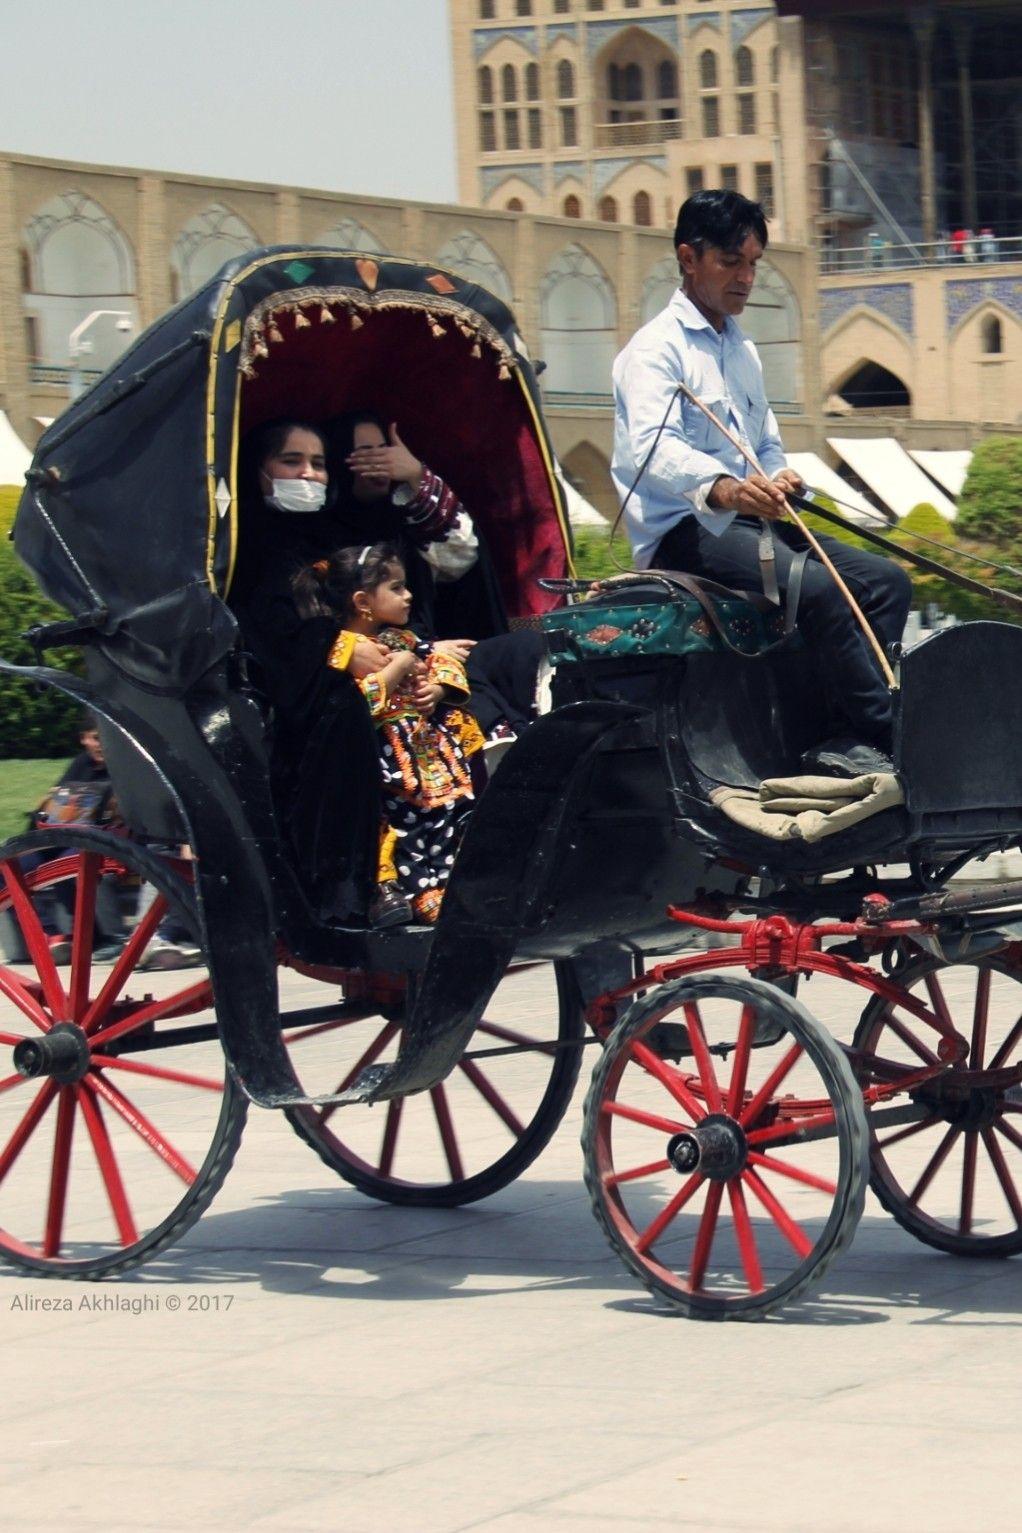 درشکه چی های اصفهان carriage isfahan naghshejahan